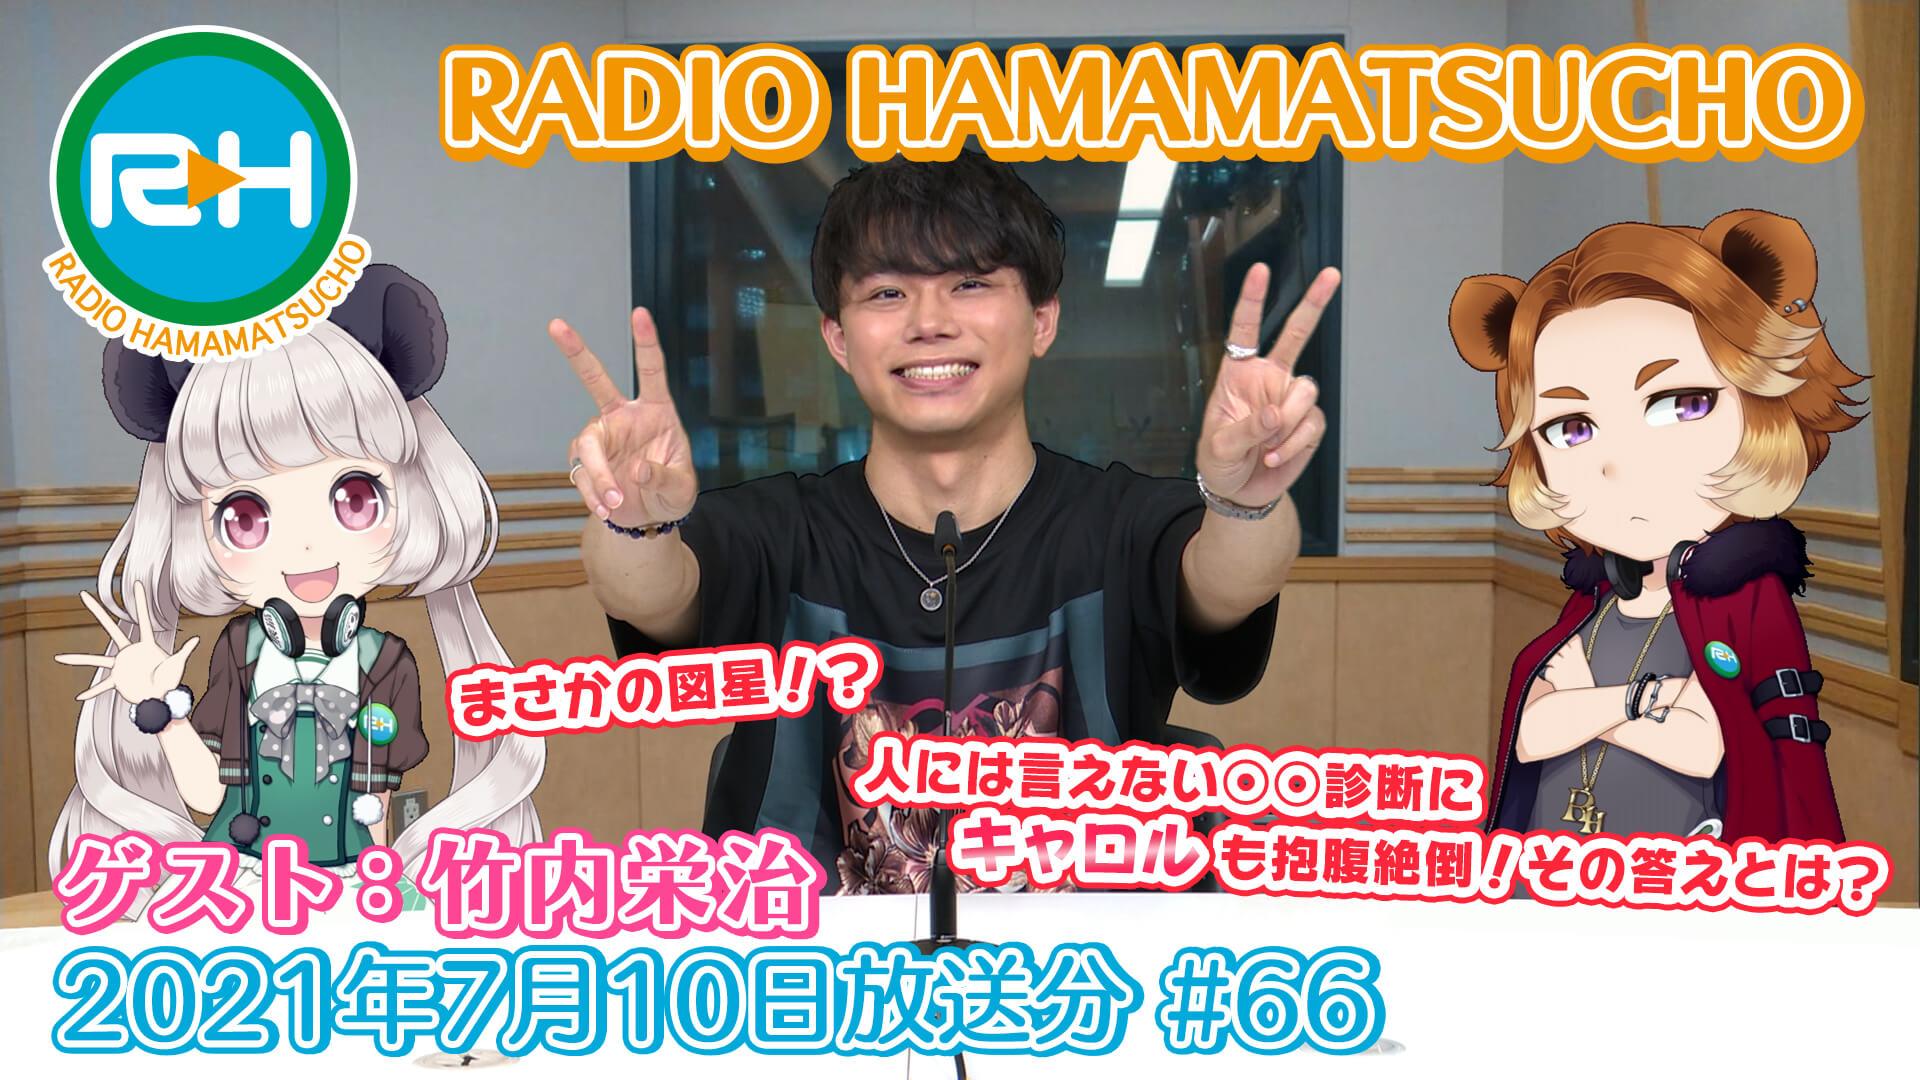 RADIO HAMAMATSUCHO 第66回 (2021年7月10日放送分) ゲスト: 竹内栄治